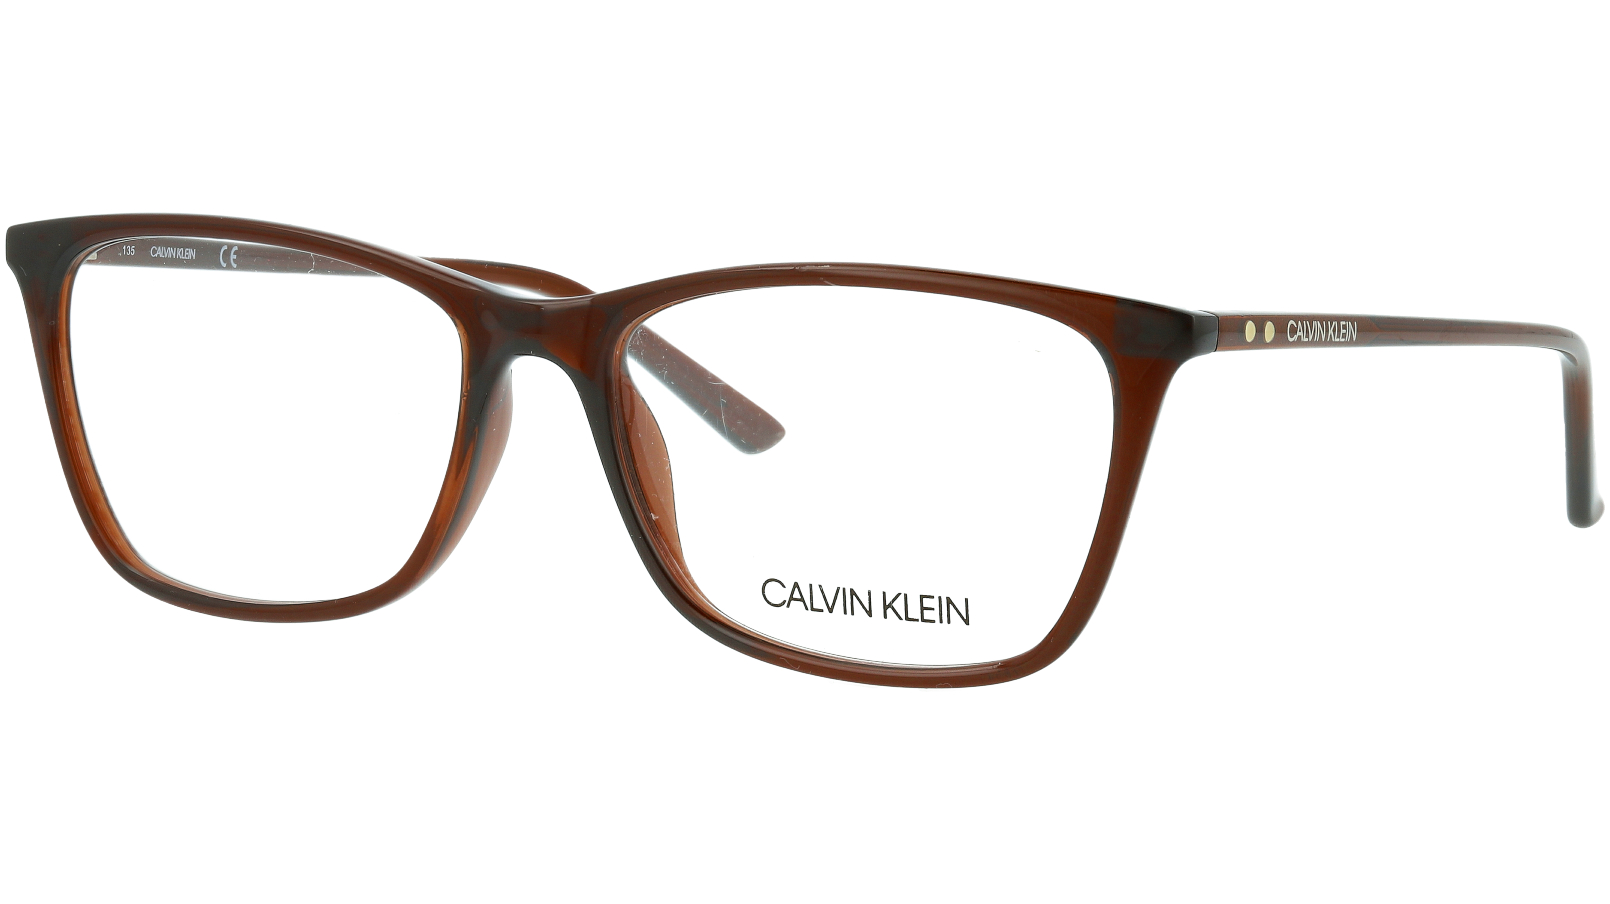 Calvin Klein CK18542 210 54 Brown Glasses